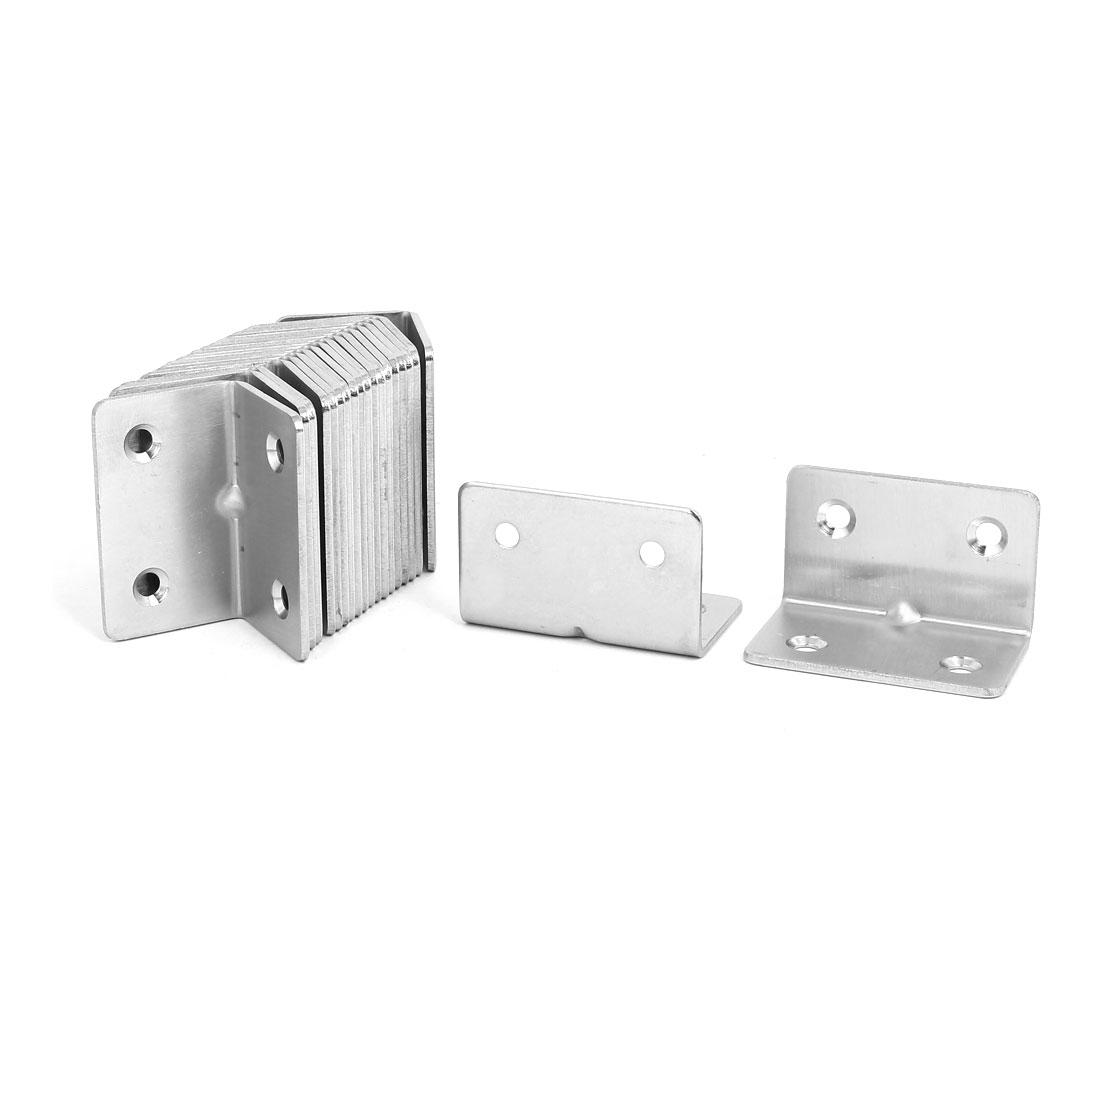 Unique Bargains31mmx31mmx50mm Stainless Steel Right Angle Bracket Corner Brace Fastener 20pcs